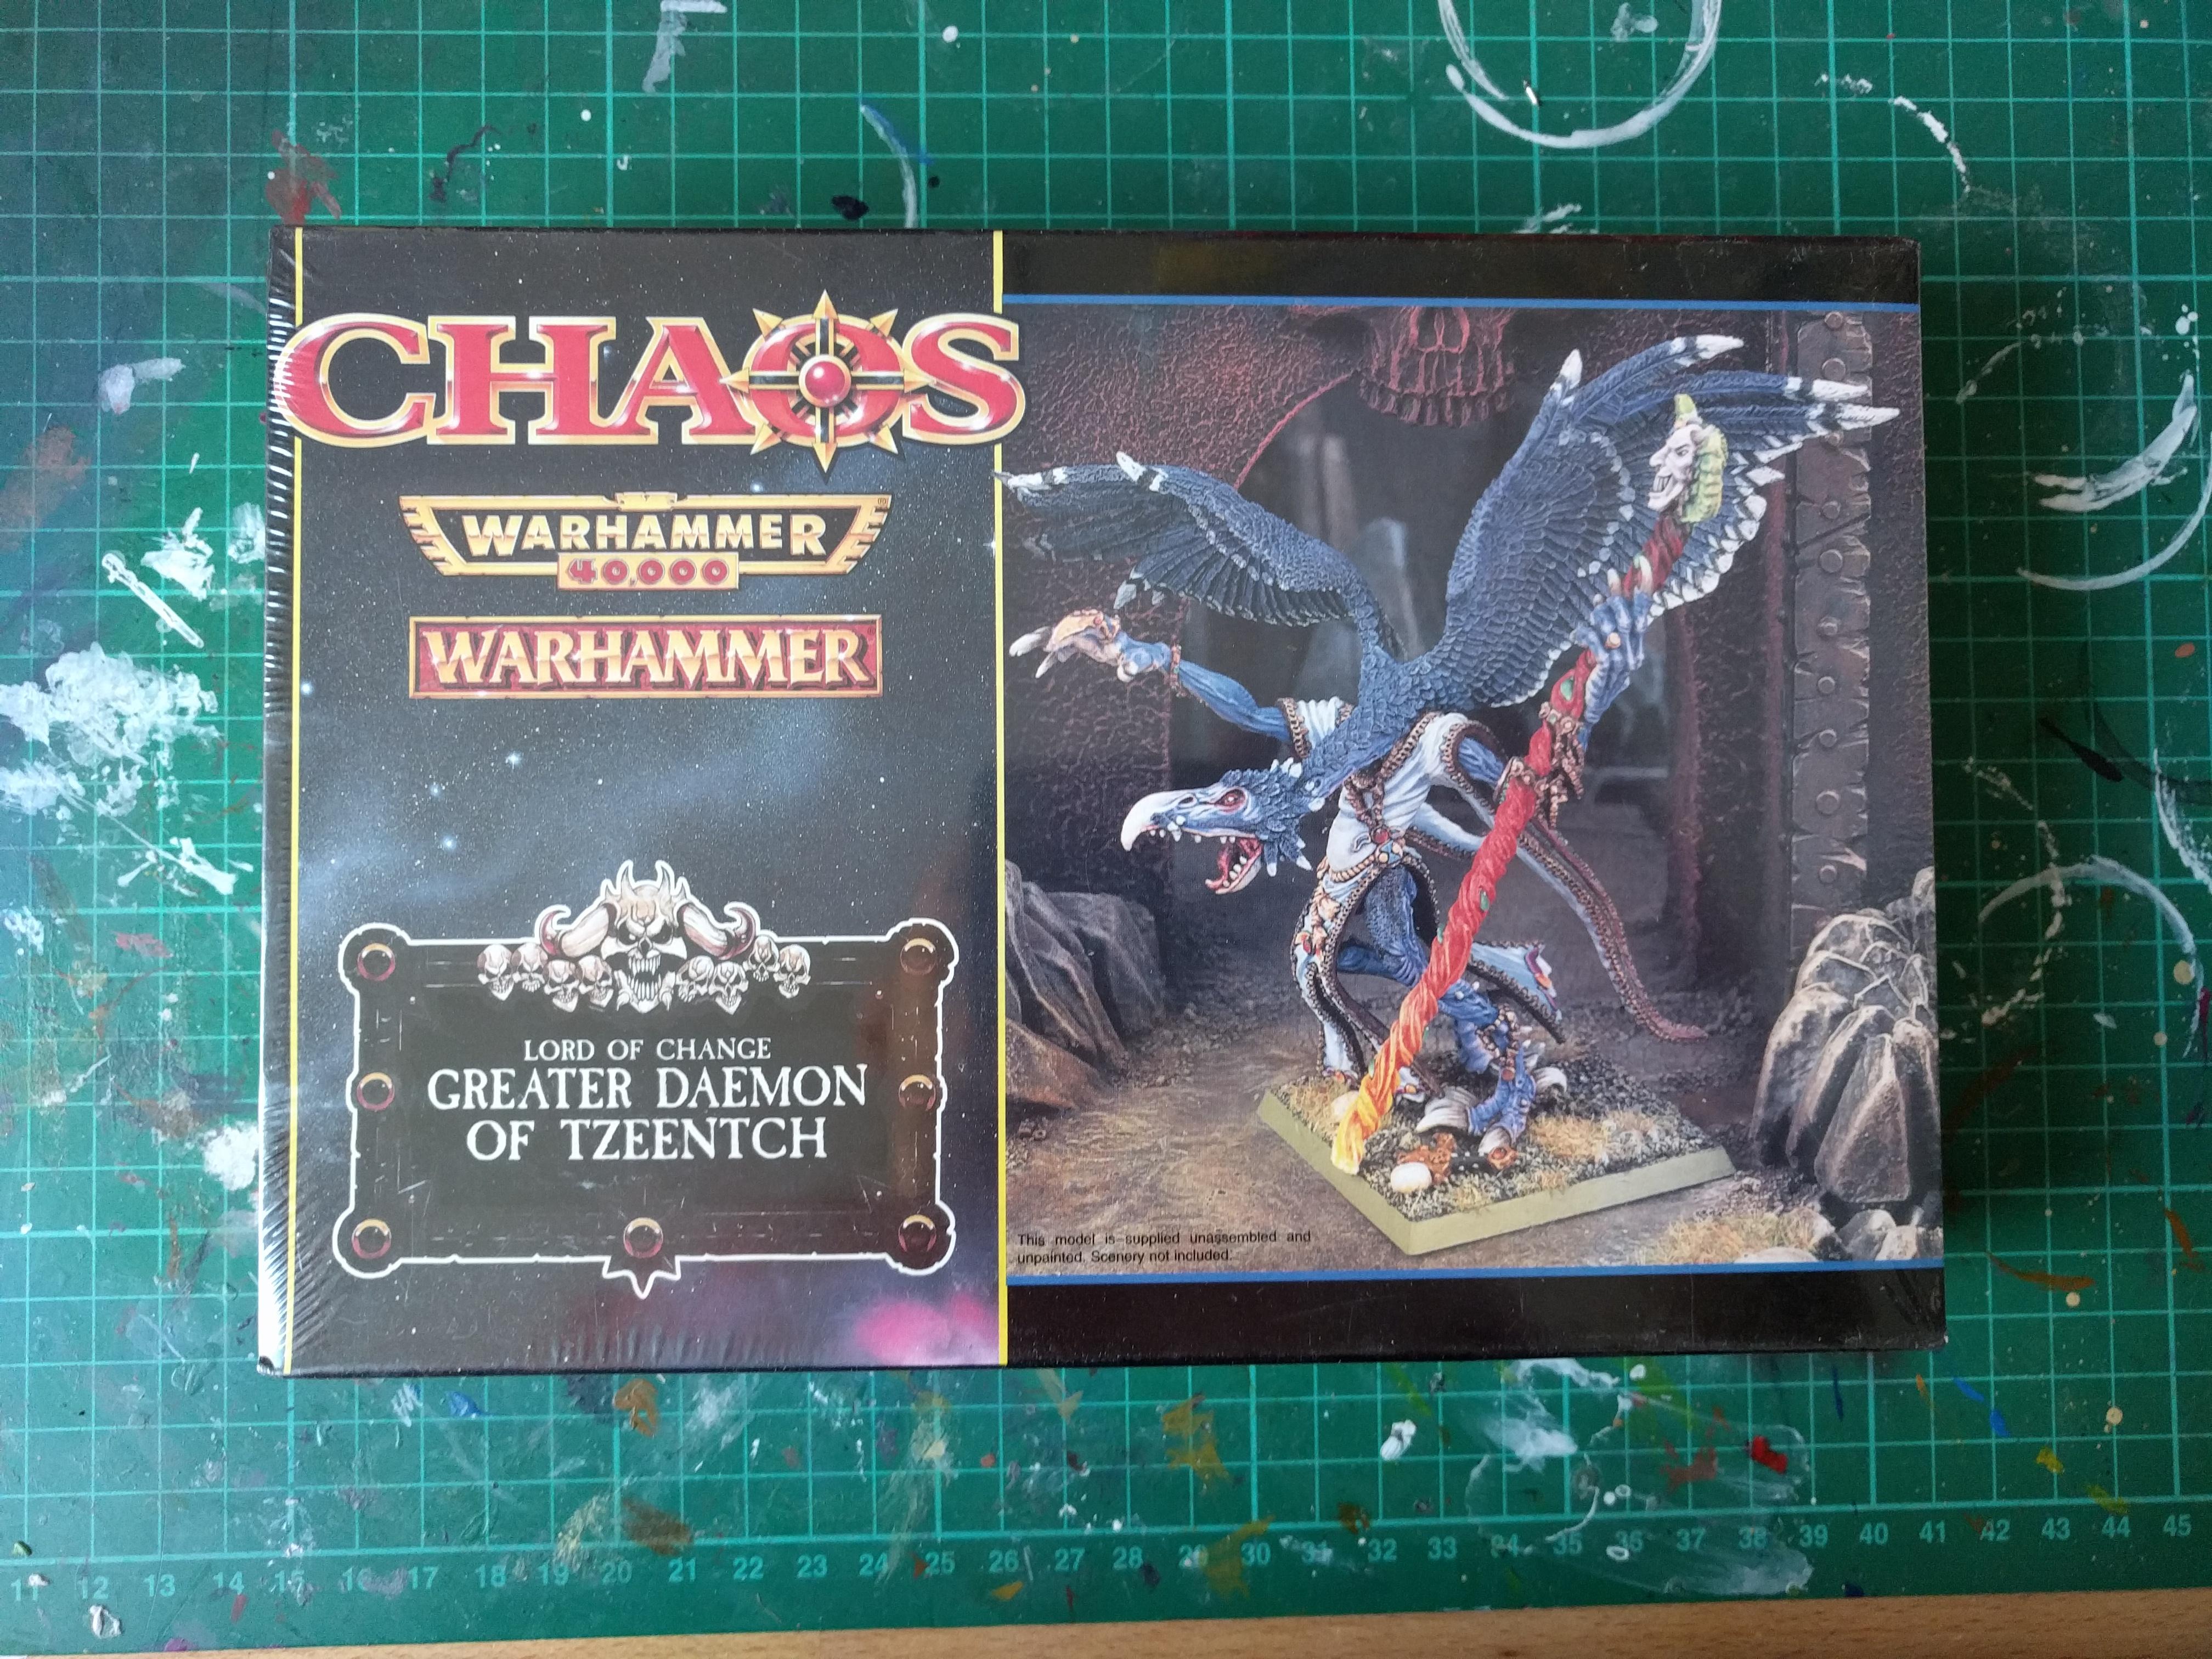 Chaos Lord of Change Great Daemon of Tzeentch